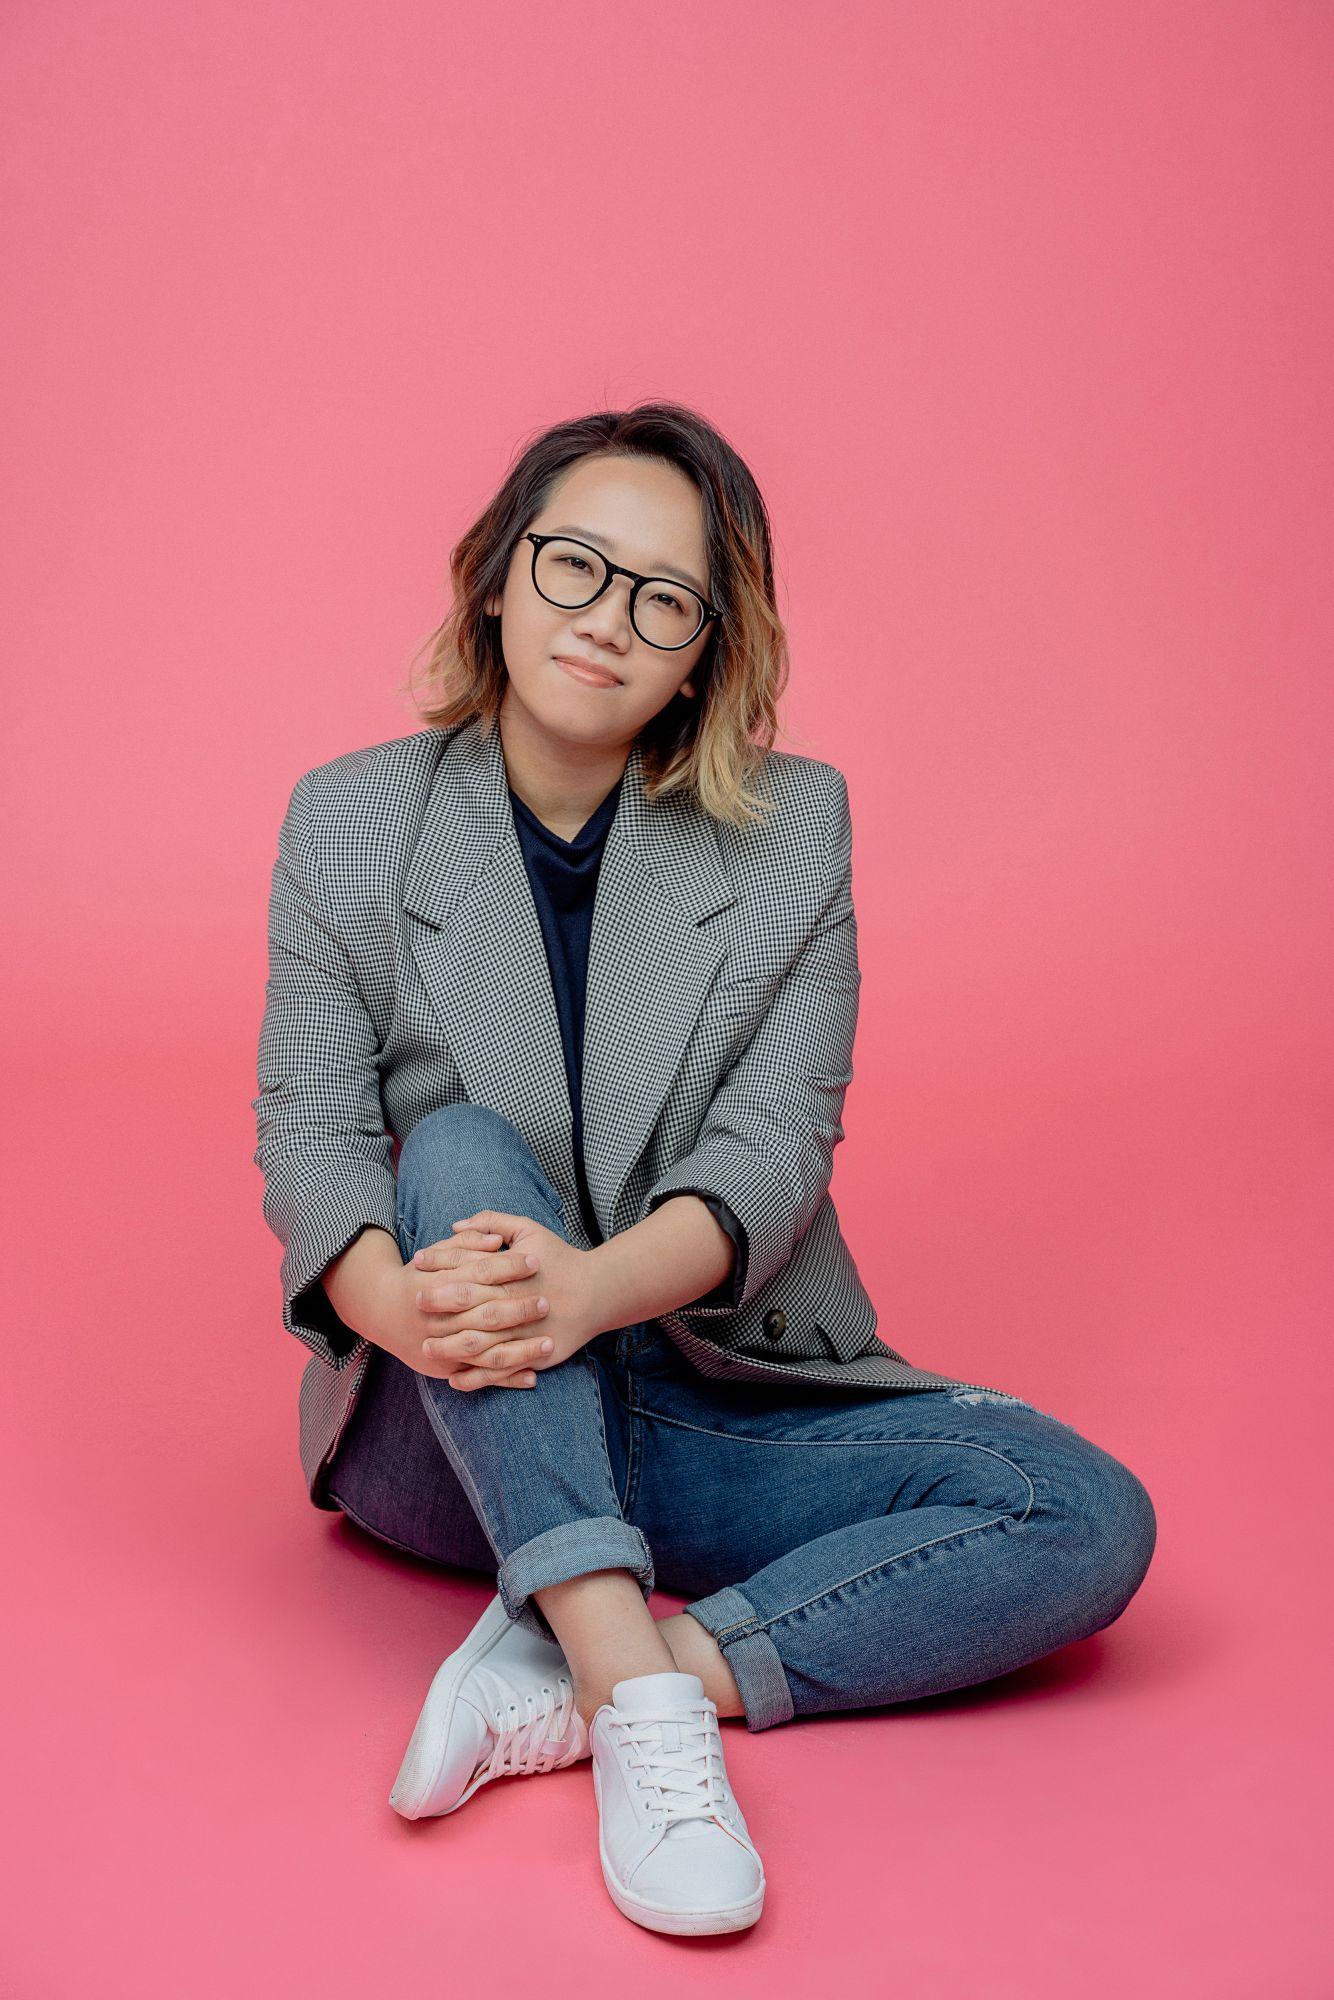 Emmy Teo